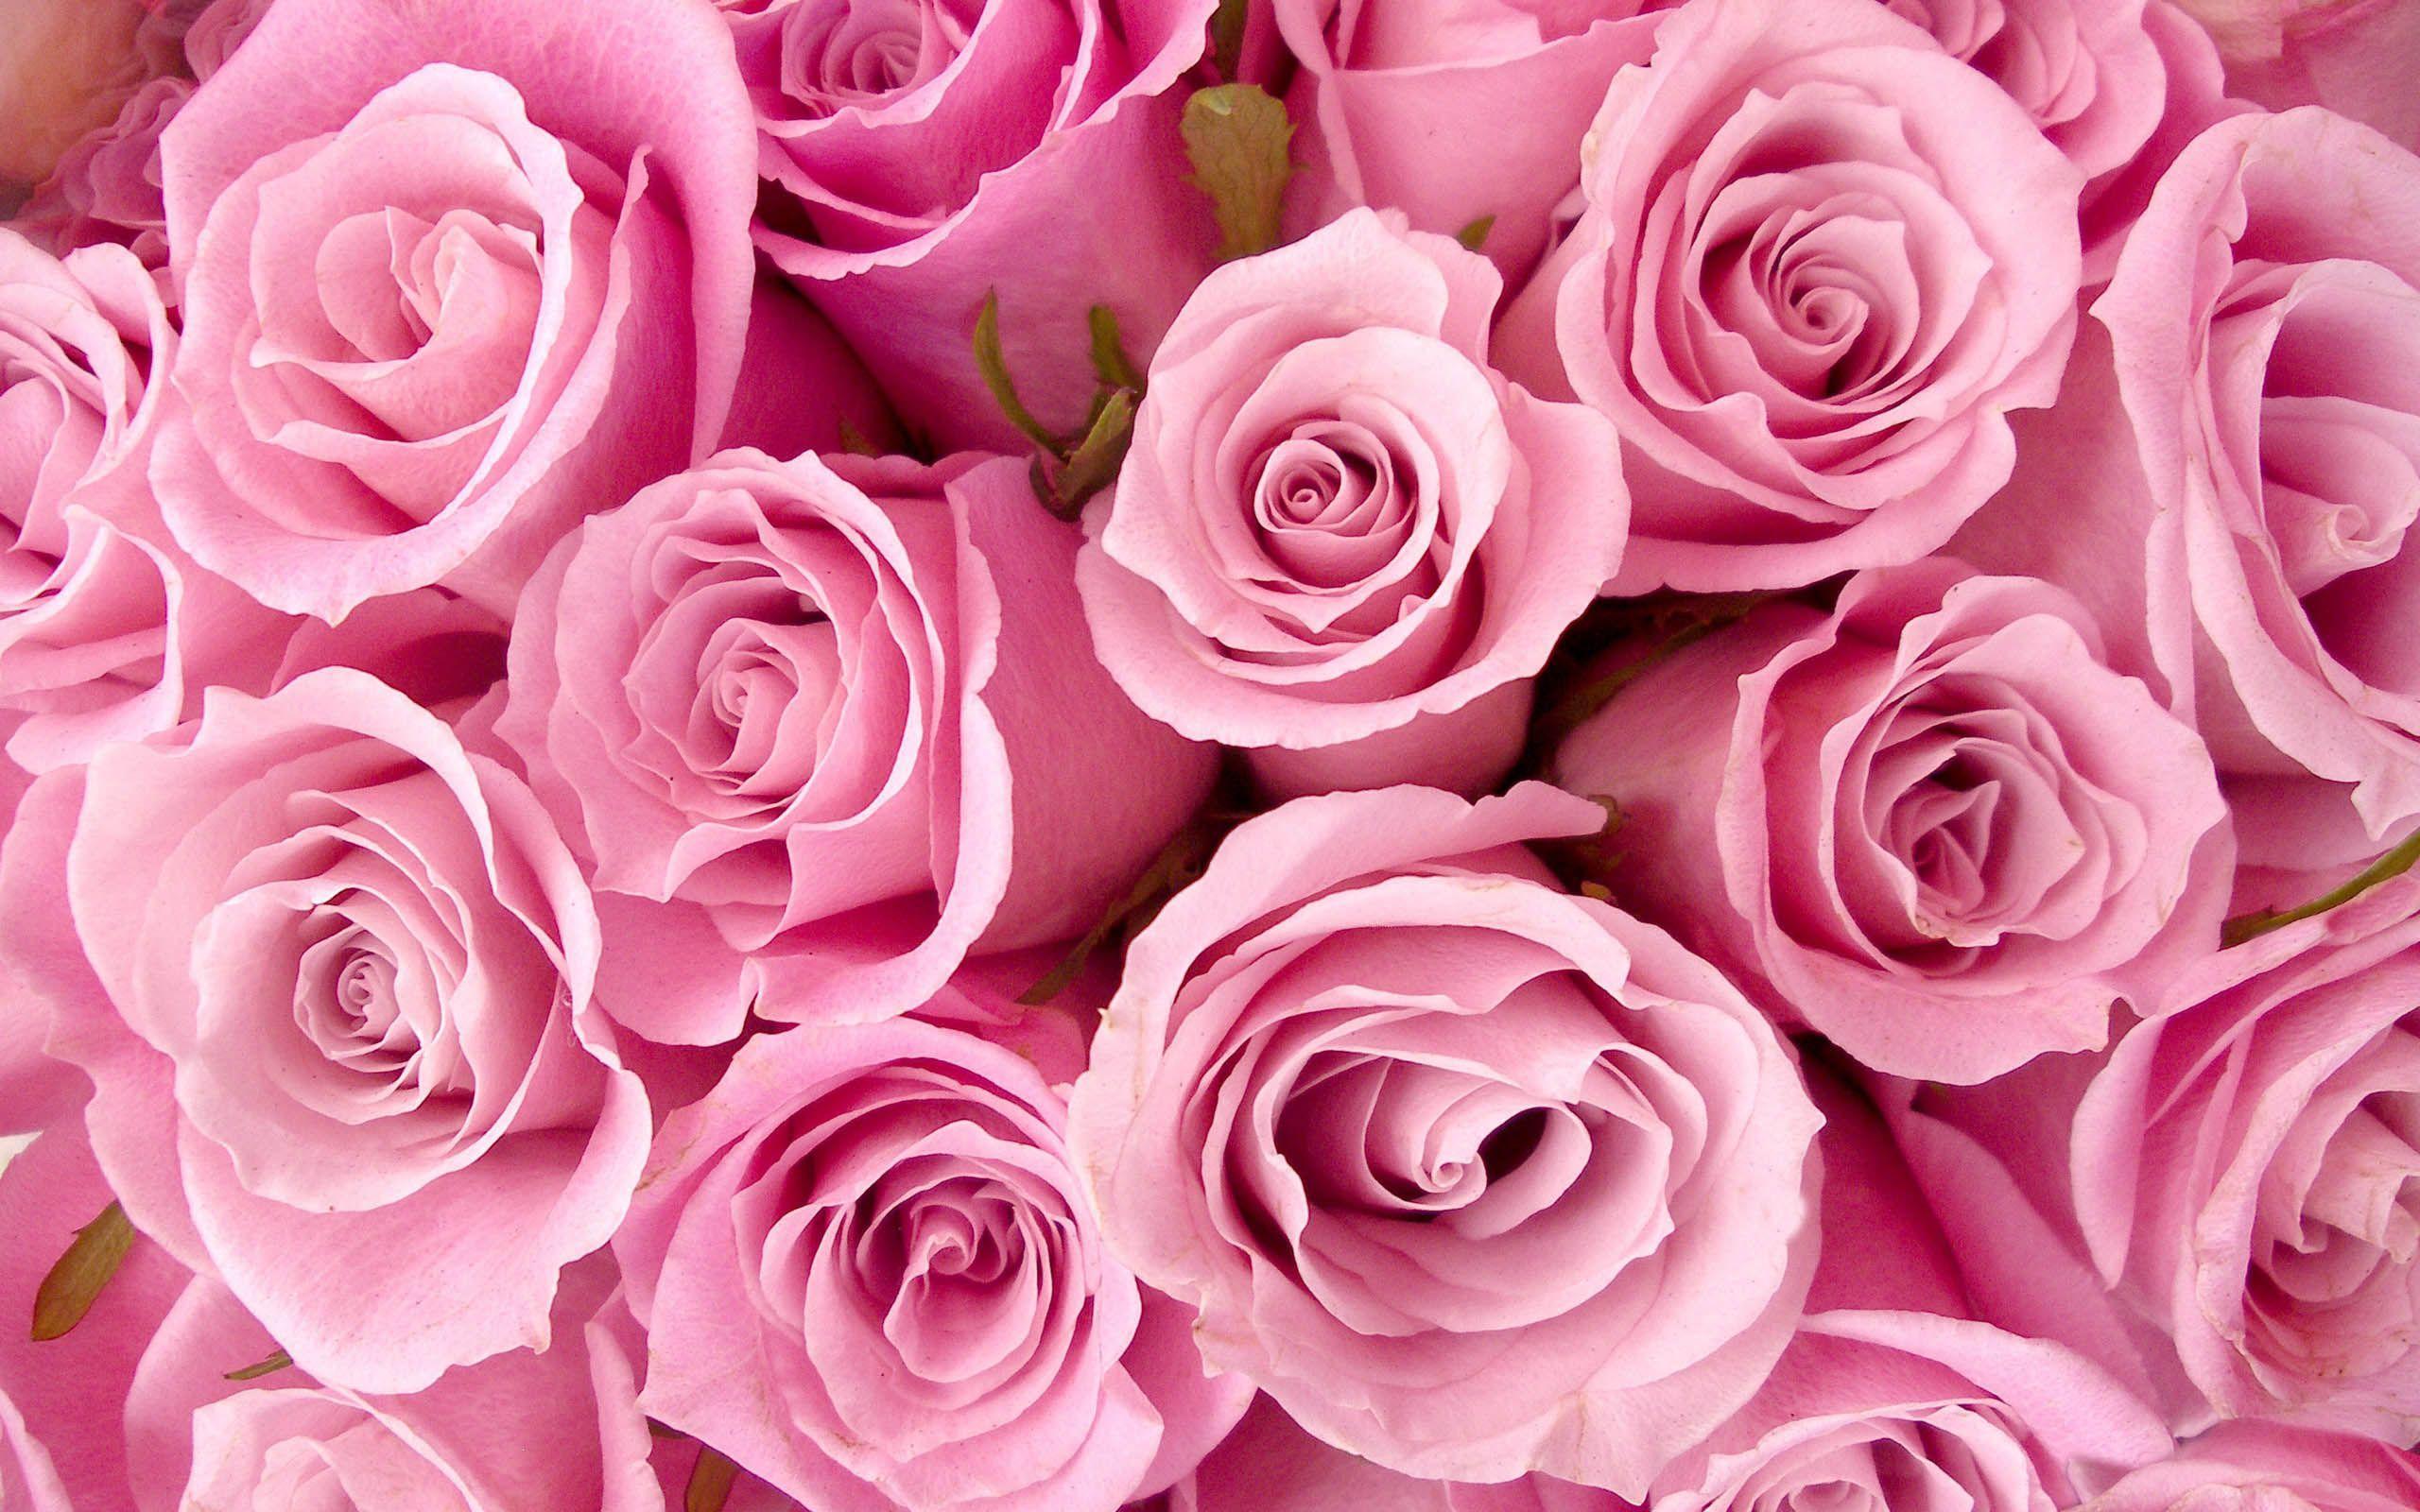 Breathtaking Flowers Pretty Pink Background Hd Wallpapers